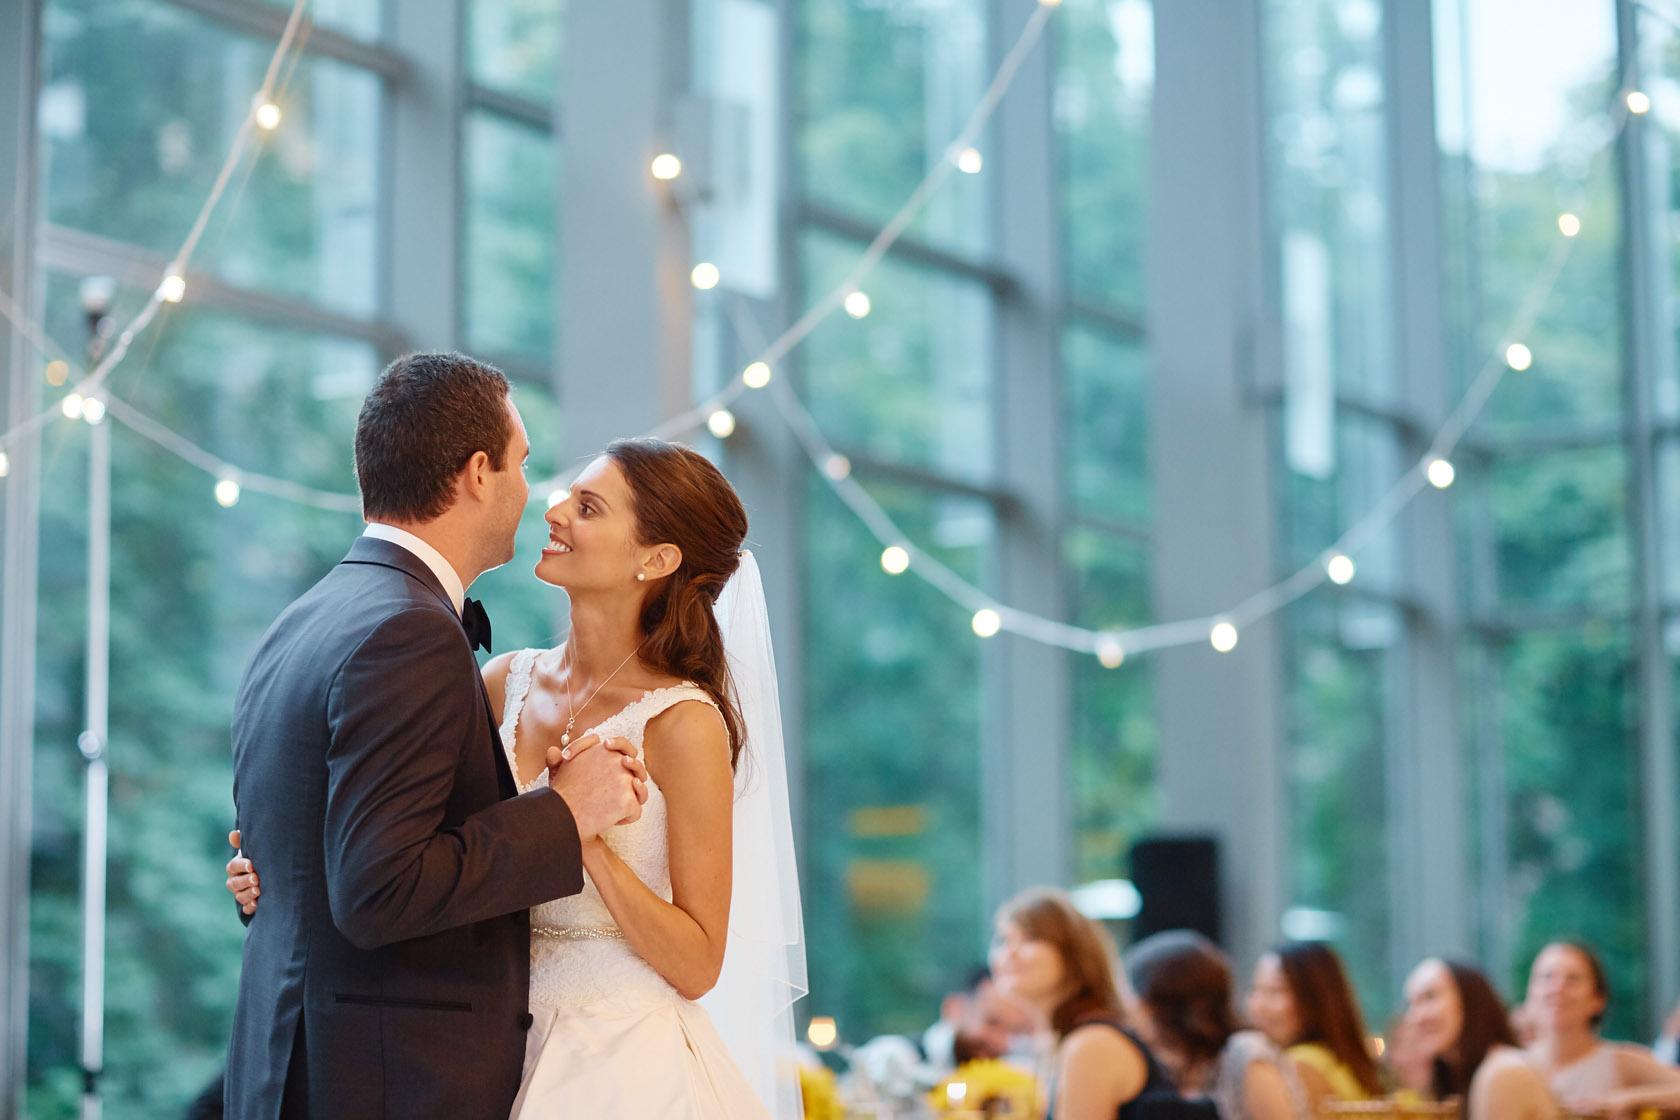 stephen sager photography 2026 toronto wedding photography